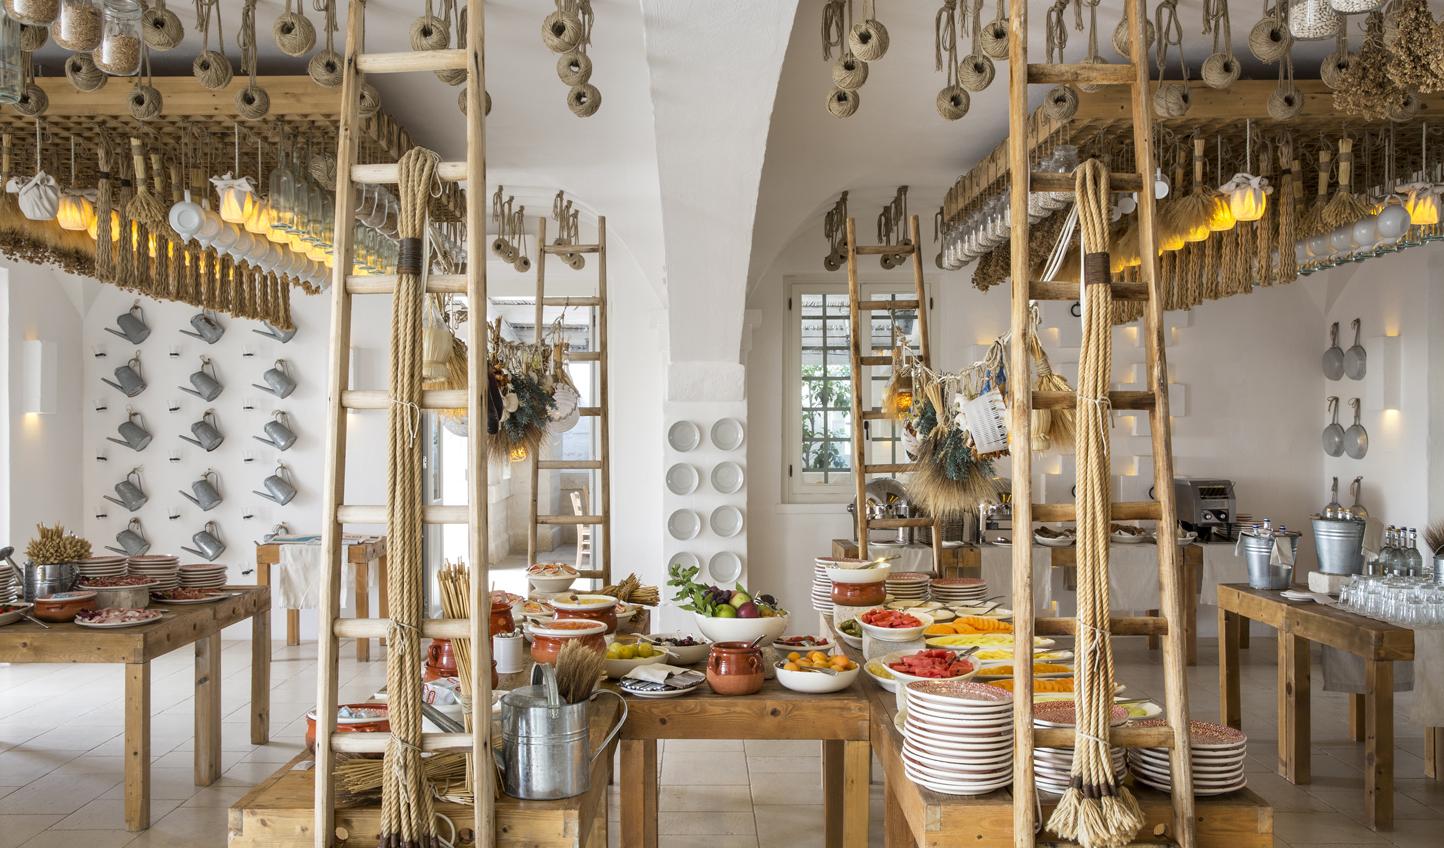 Enjoy an authentic Italian family meal at La Frasca